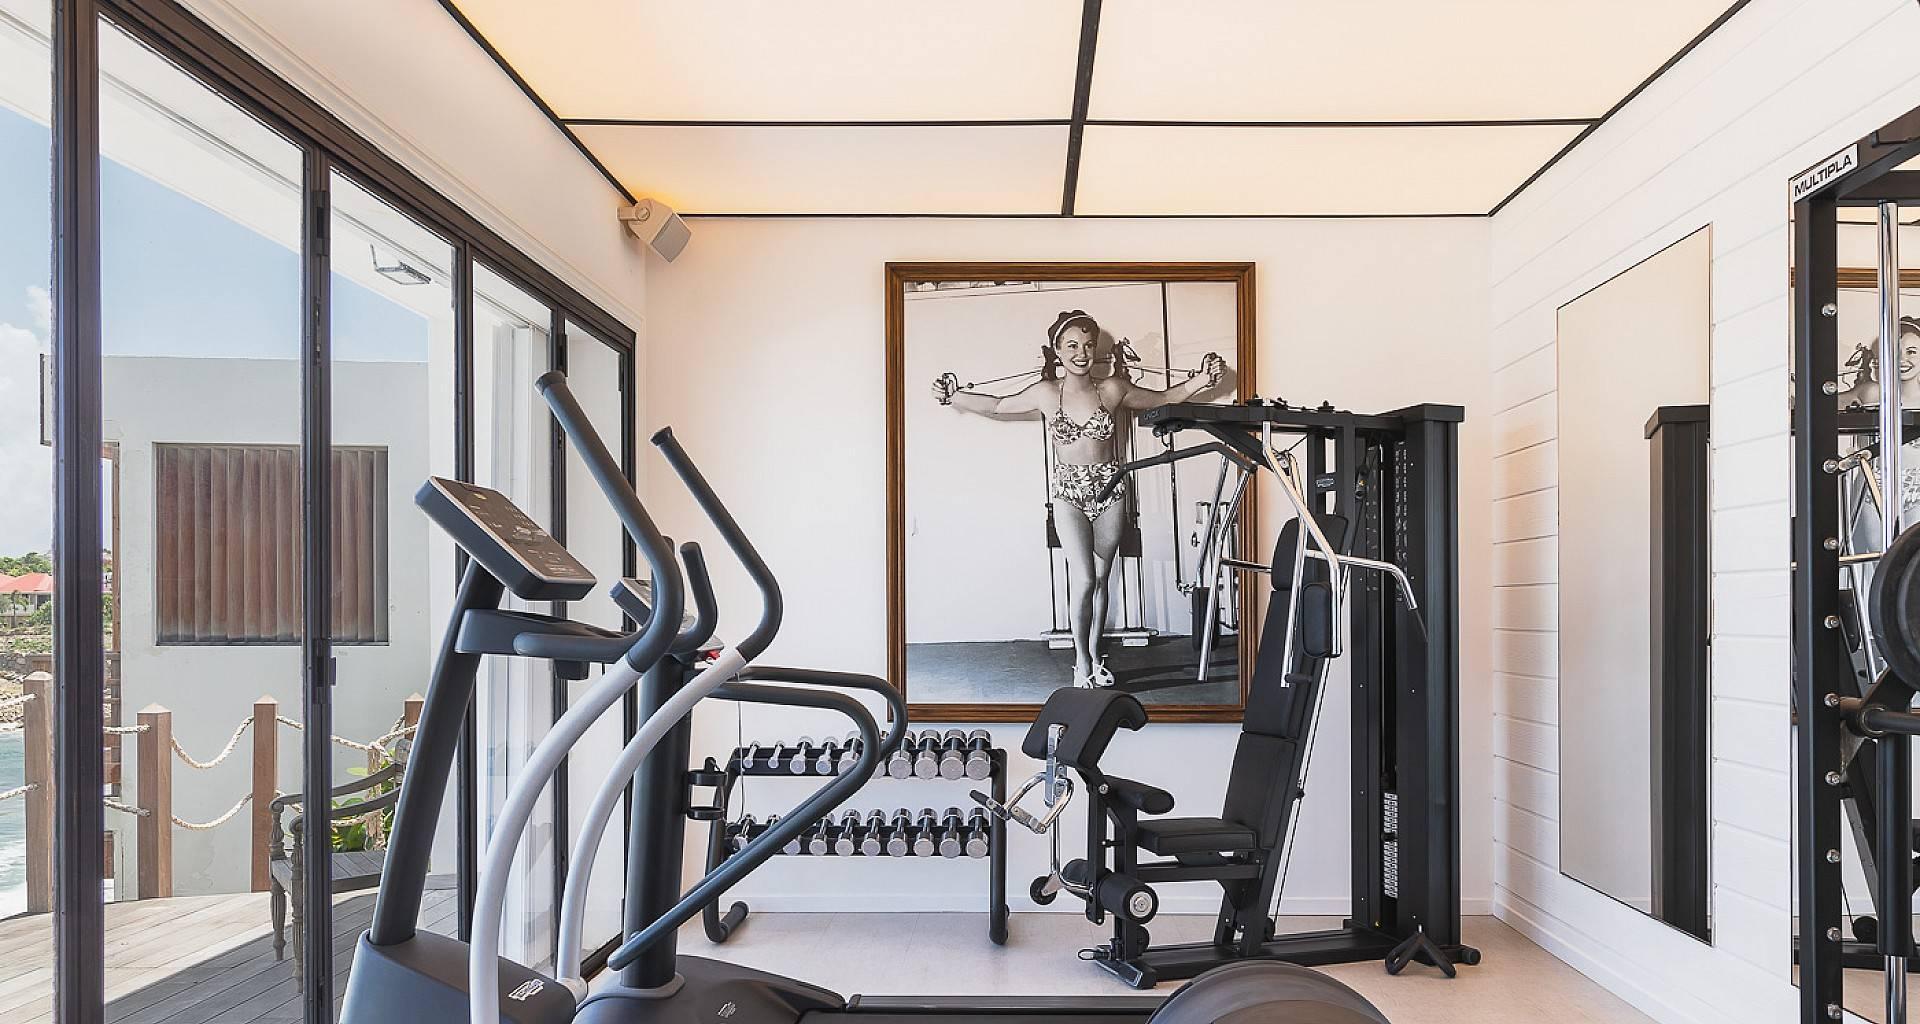 Villa Les Lataniers Fitness Room